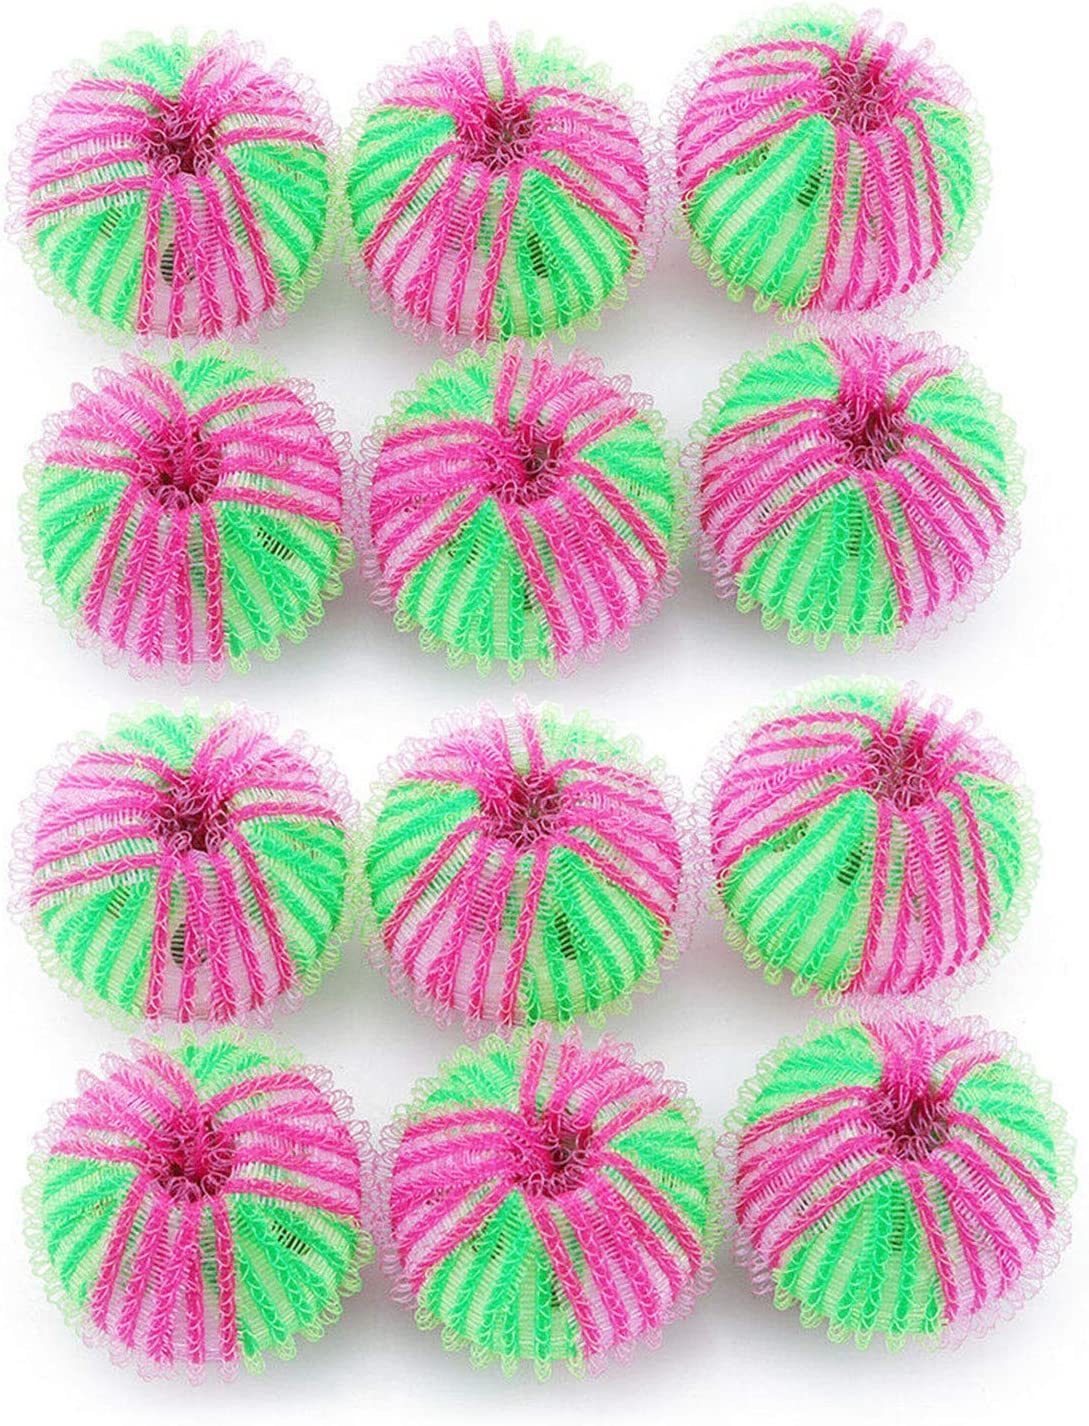 Washing Balls 12Pcs Lint Remover Washing Balls Reusable Floating Pet Hair Remover Ball Hair Lint Grabbing Wash Ball for Removing Pet Hair//Clothes//Bedding in The Washing Machine